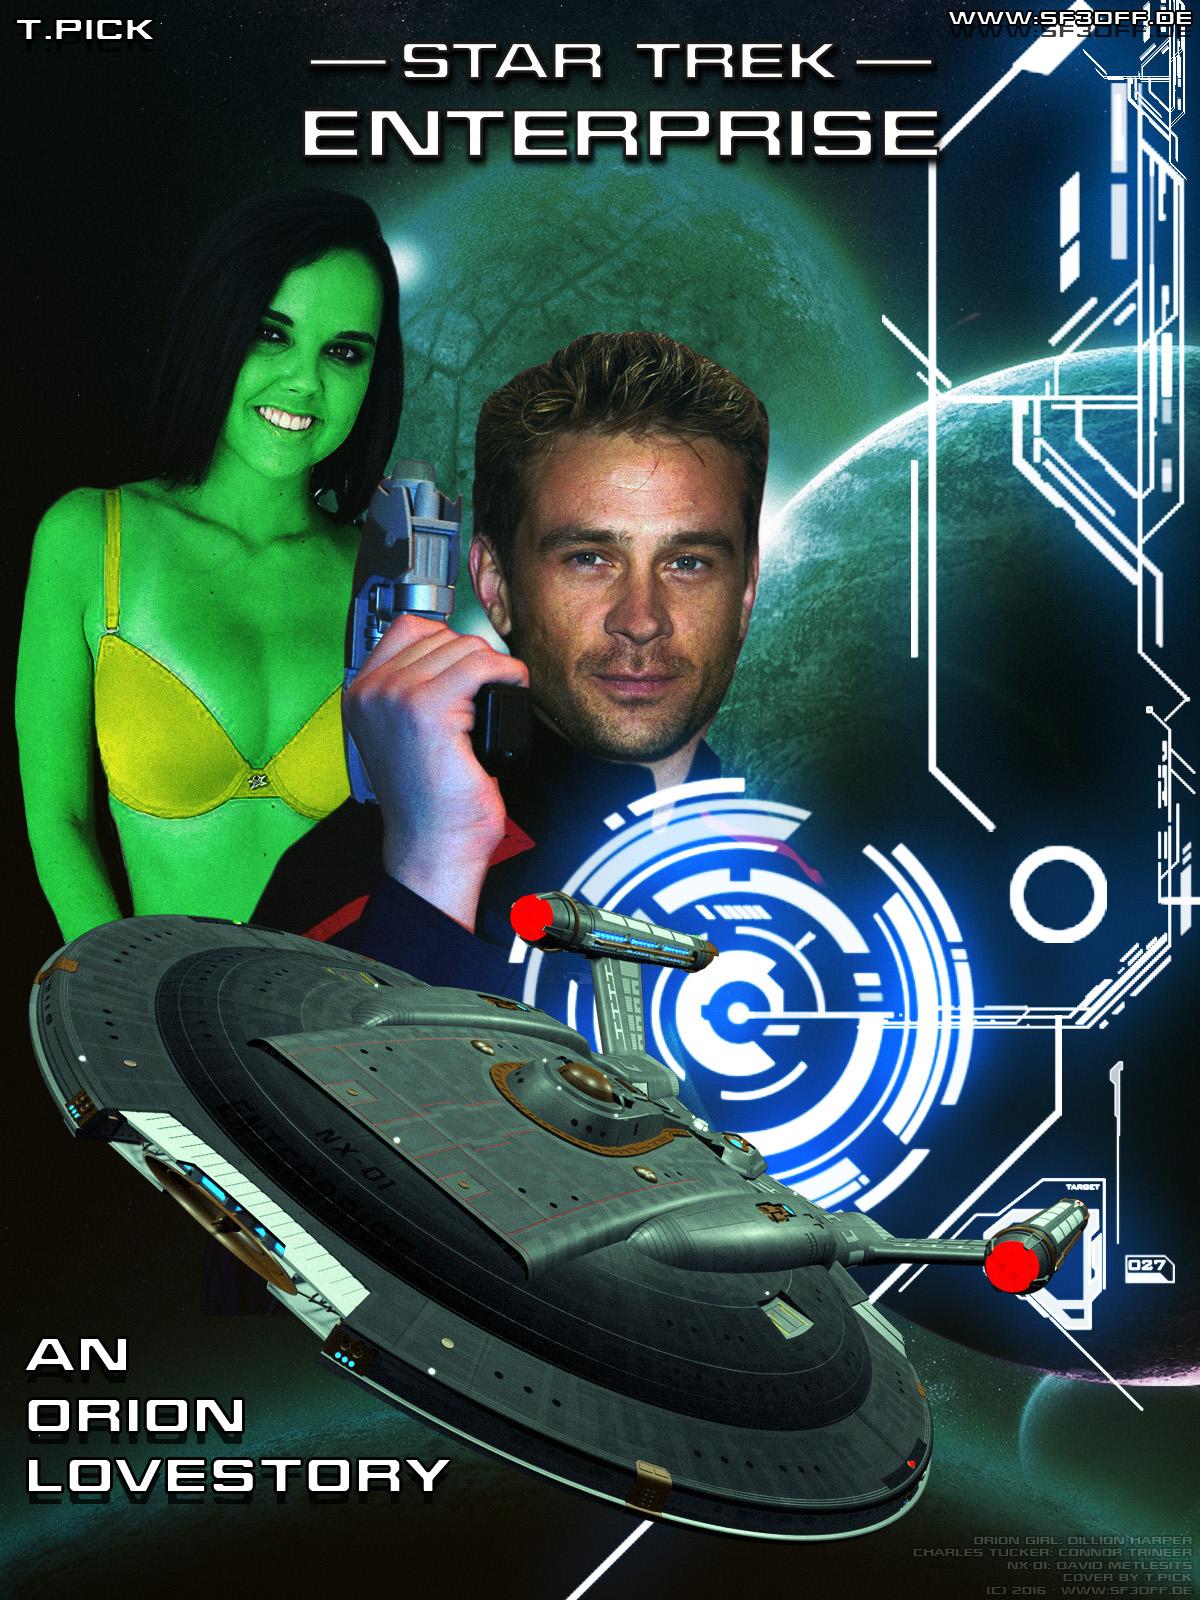 Star Trek - Enterprise - An orion Lovestory by Joran-Belar